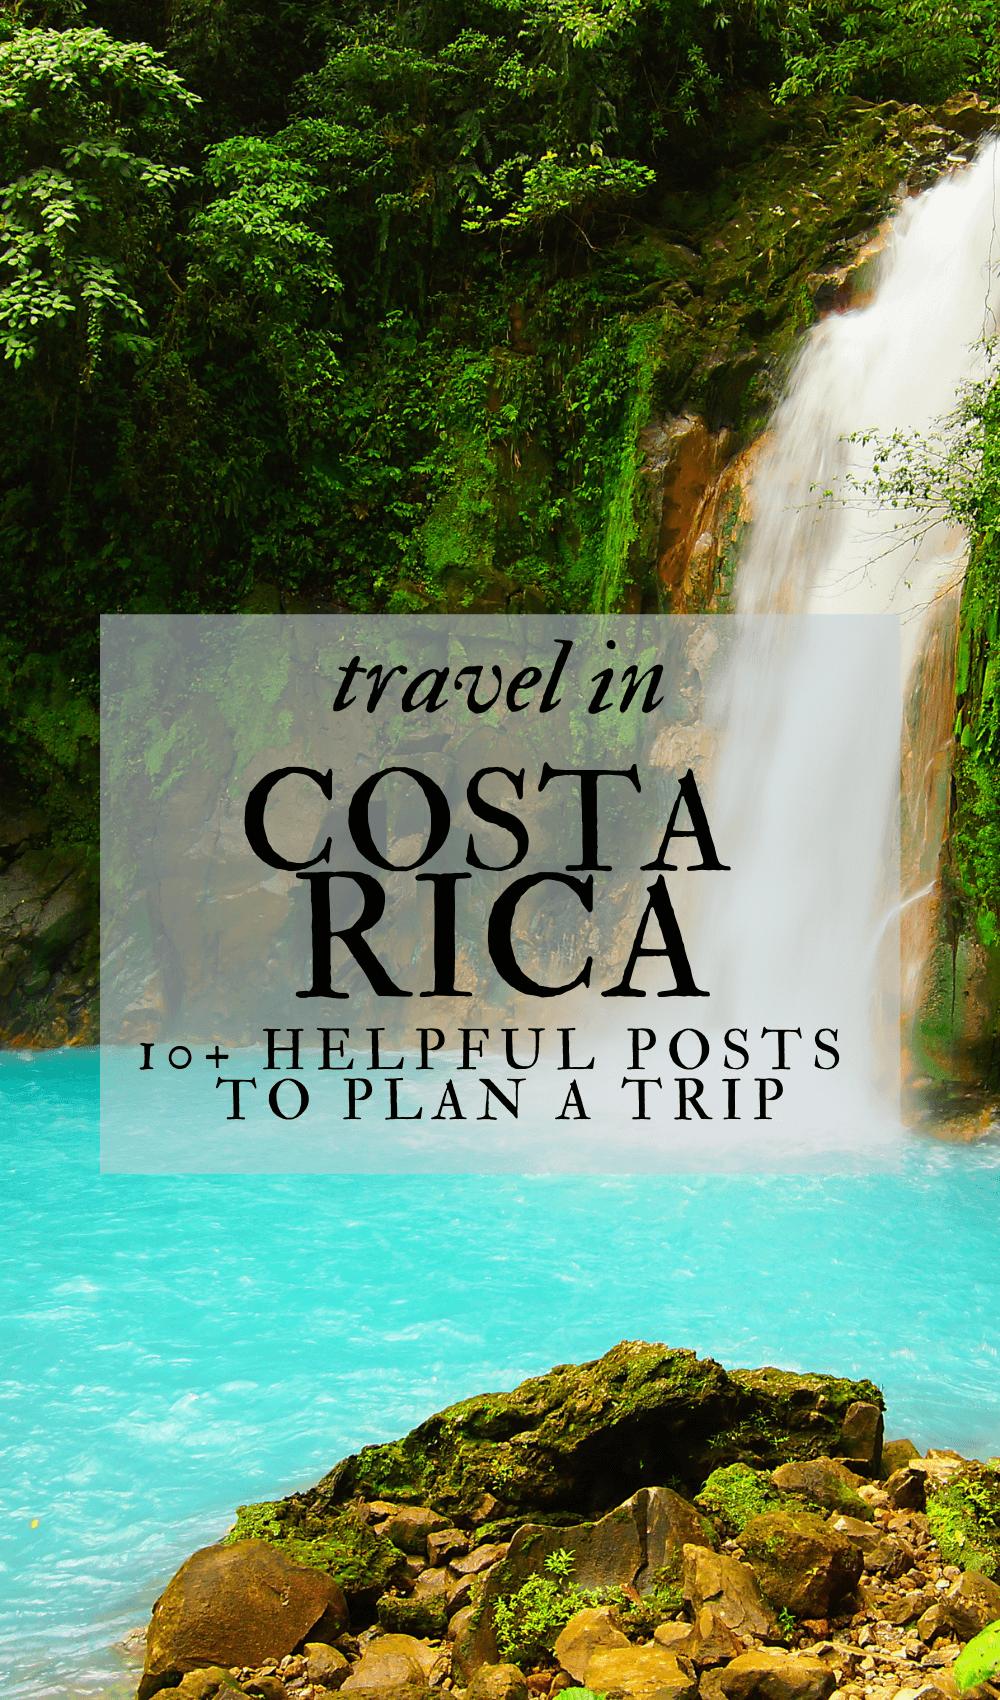 GLOBAL DIRECTORY: COSTA RICA